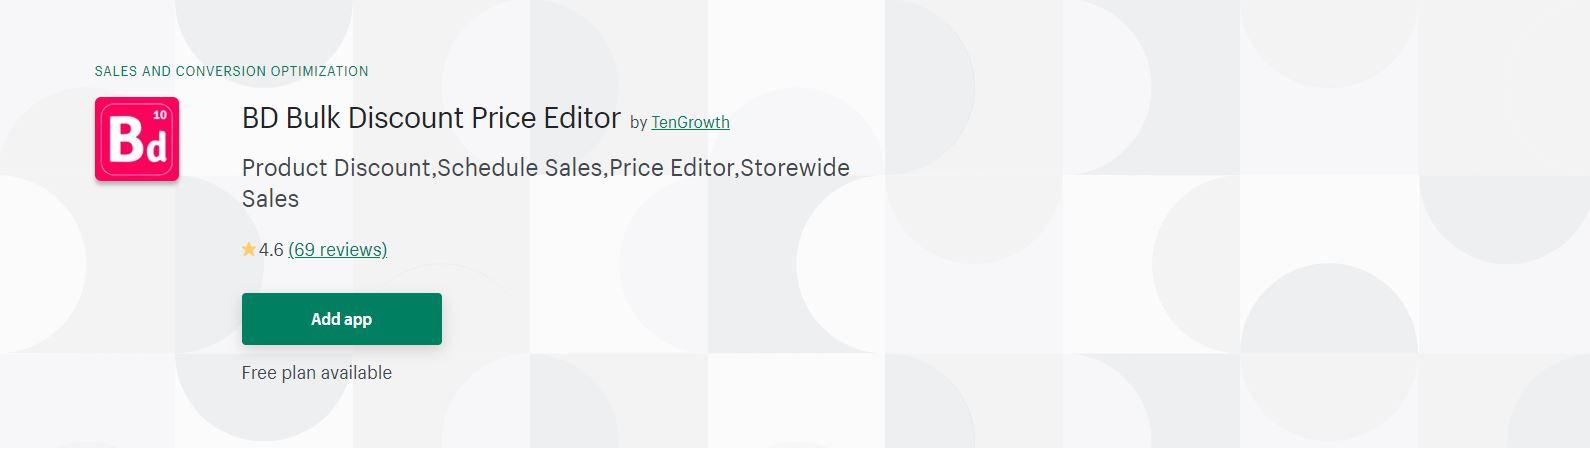 BD Bulk Discount Price Editor